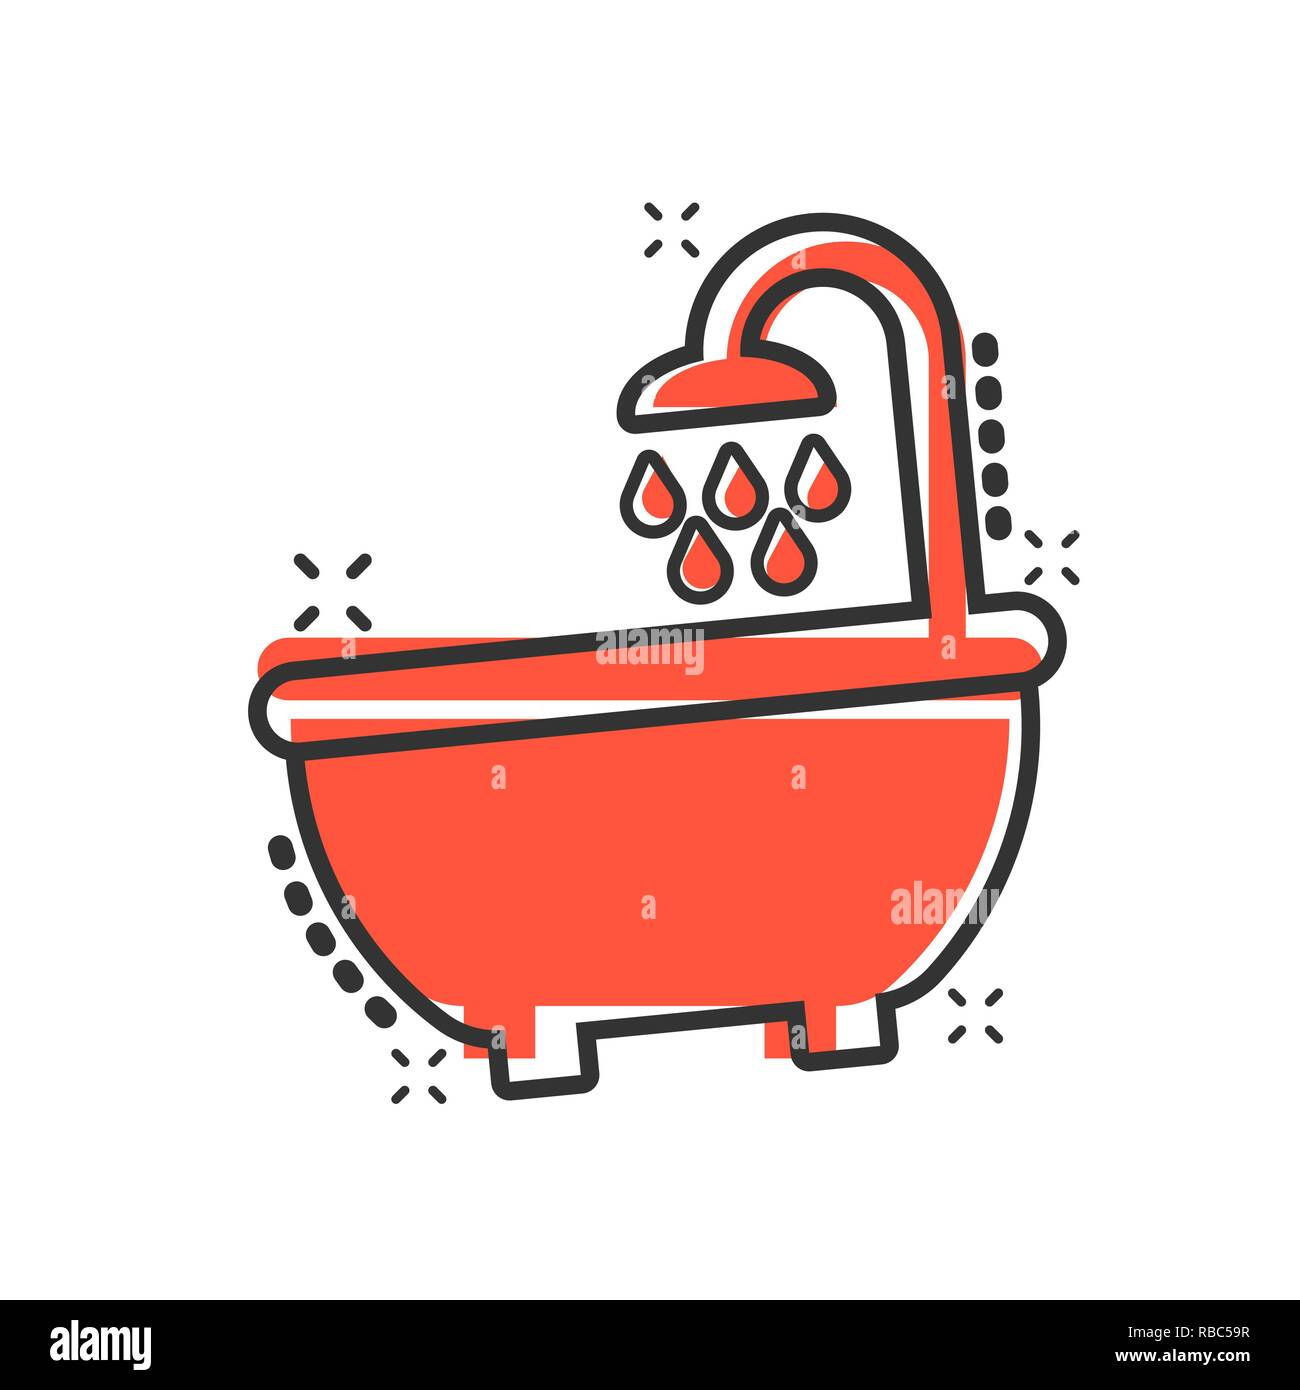 badewanne comic bilder